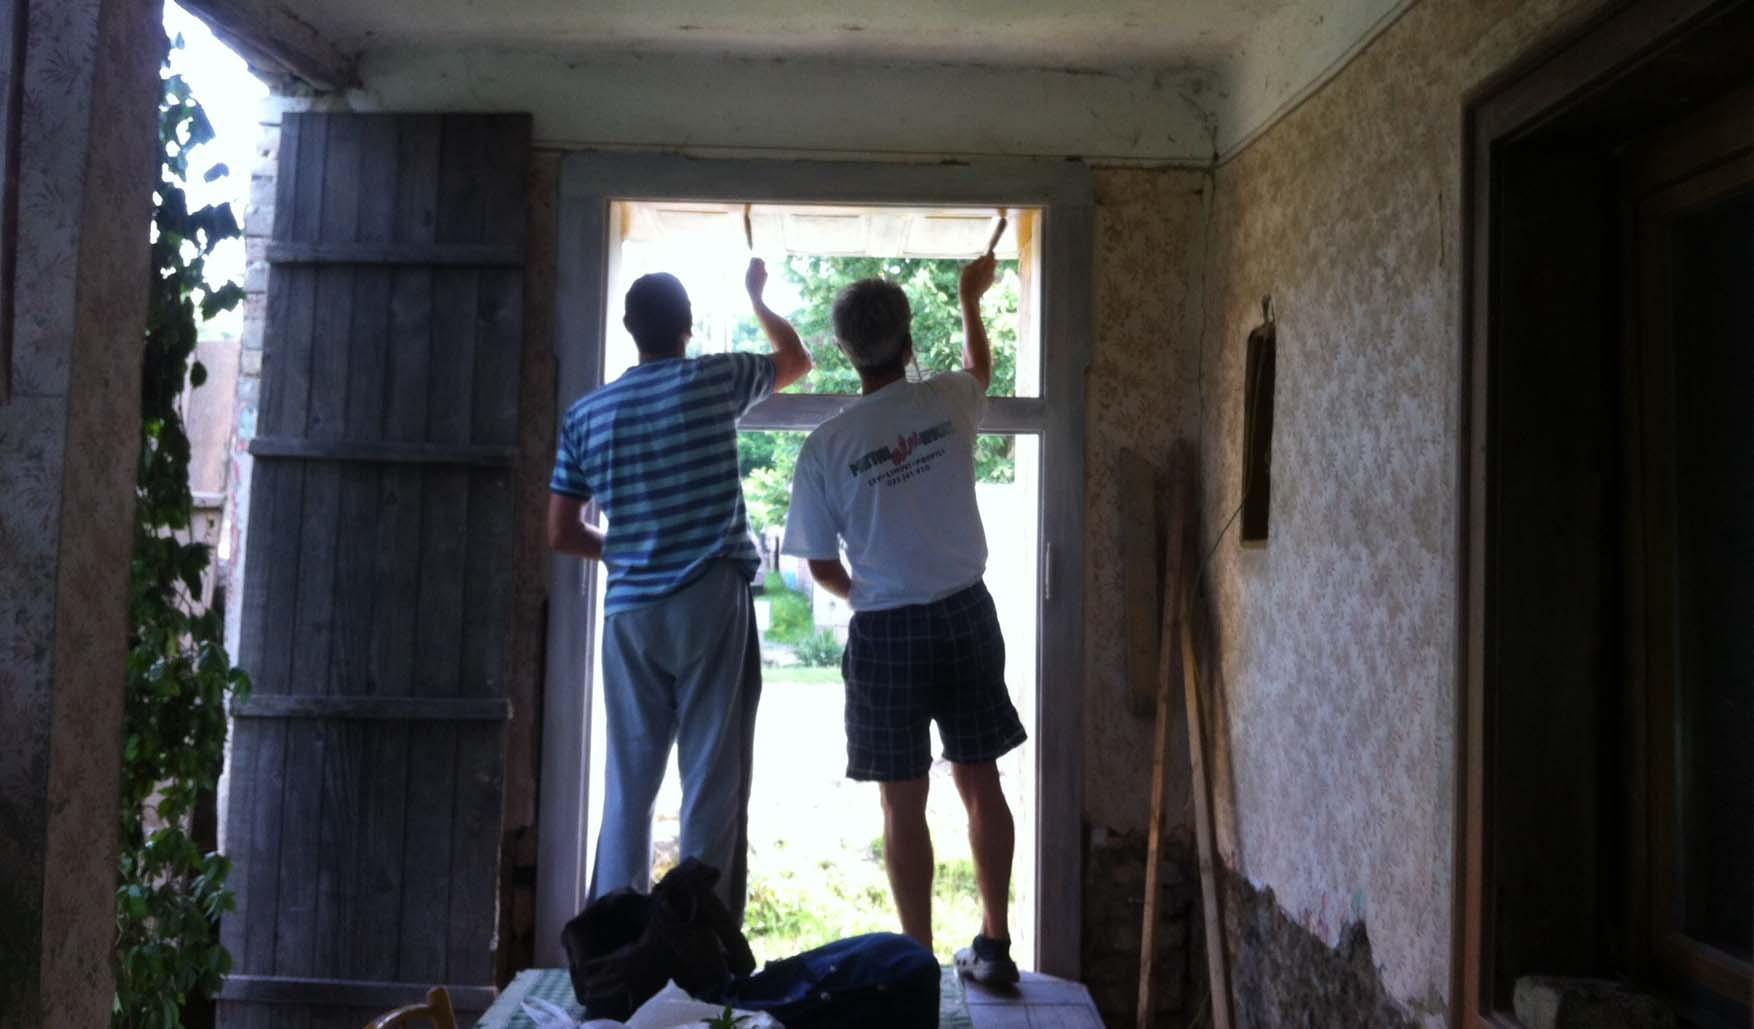 05 Mosorin radionica Gorjana i ekipa farbanje okvira vrata i prozora